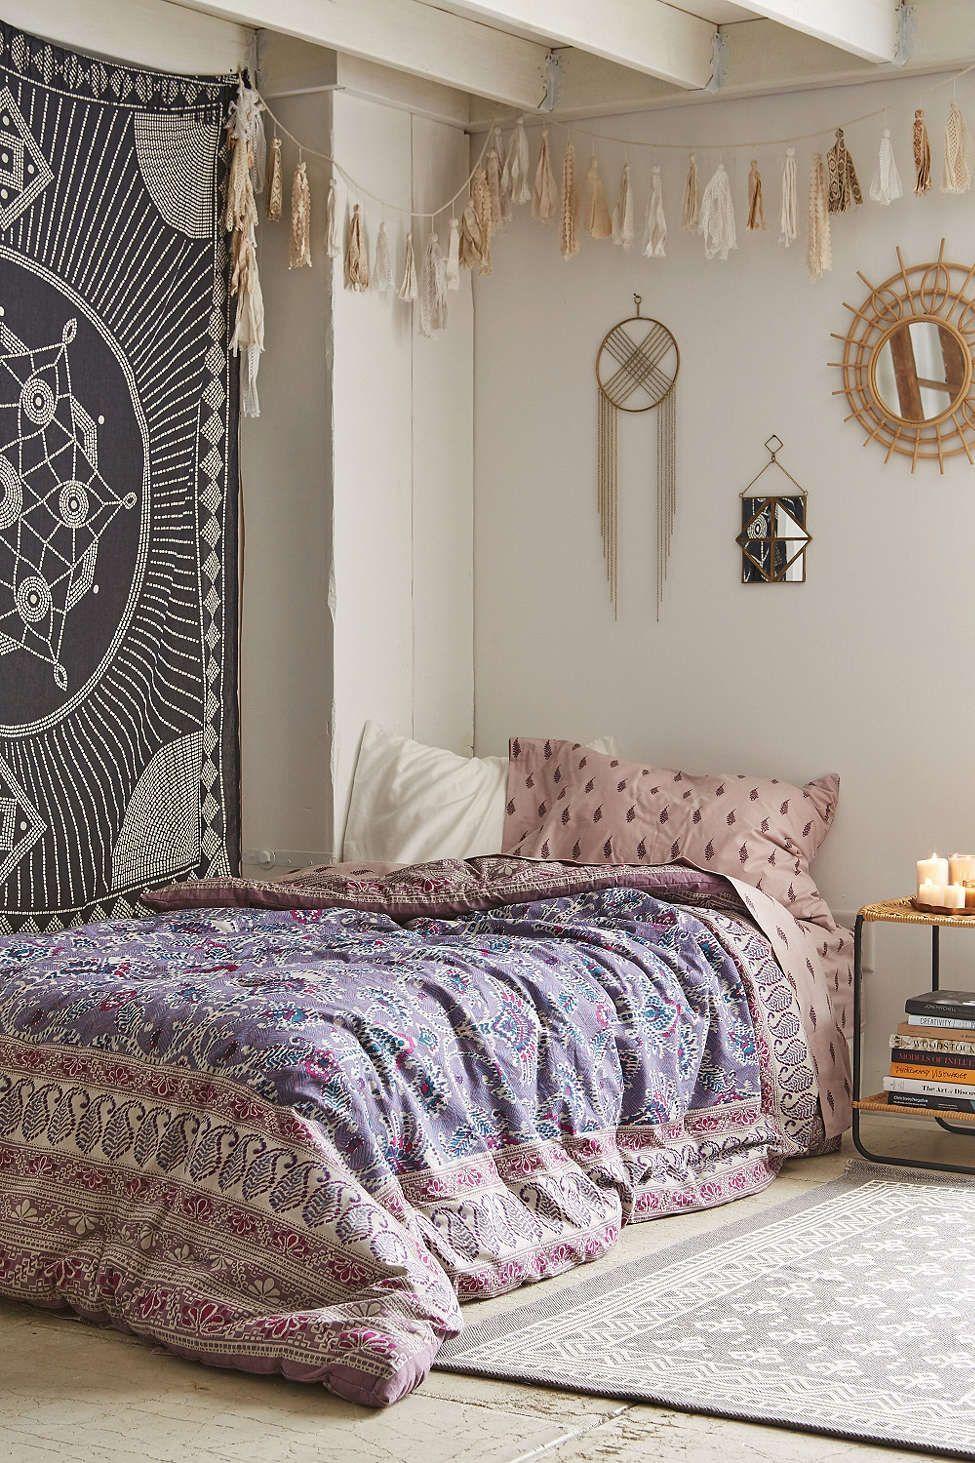 Plum& Bow Hazelle Comforter Snooze Set Inredning, Sovrum och House